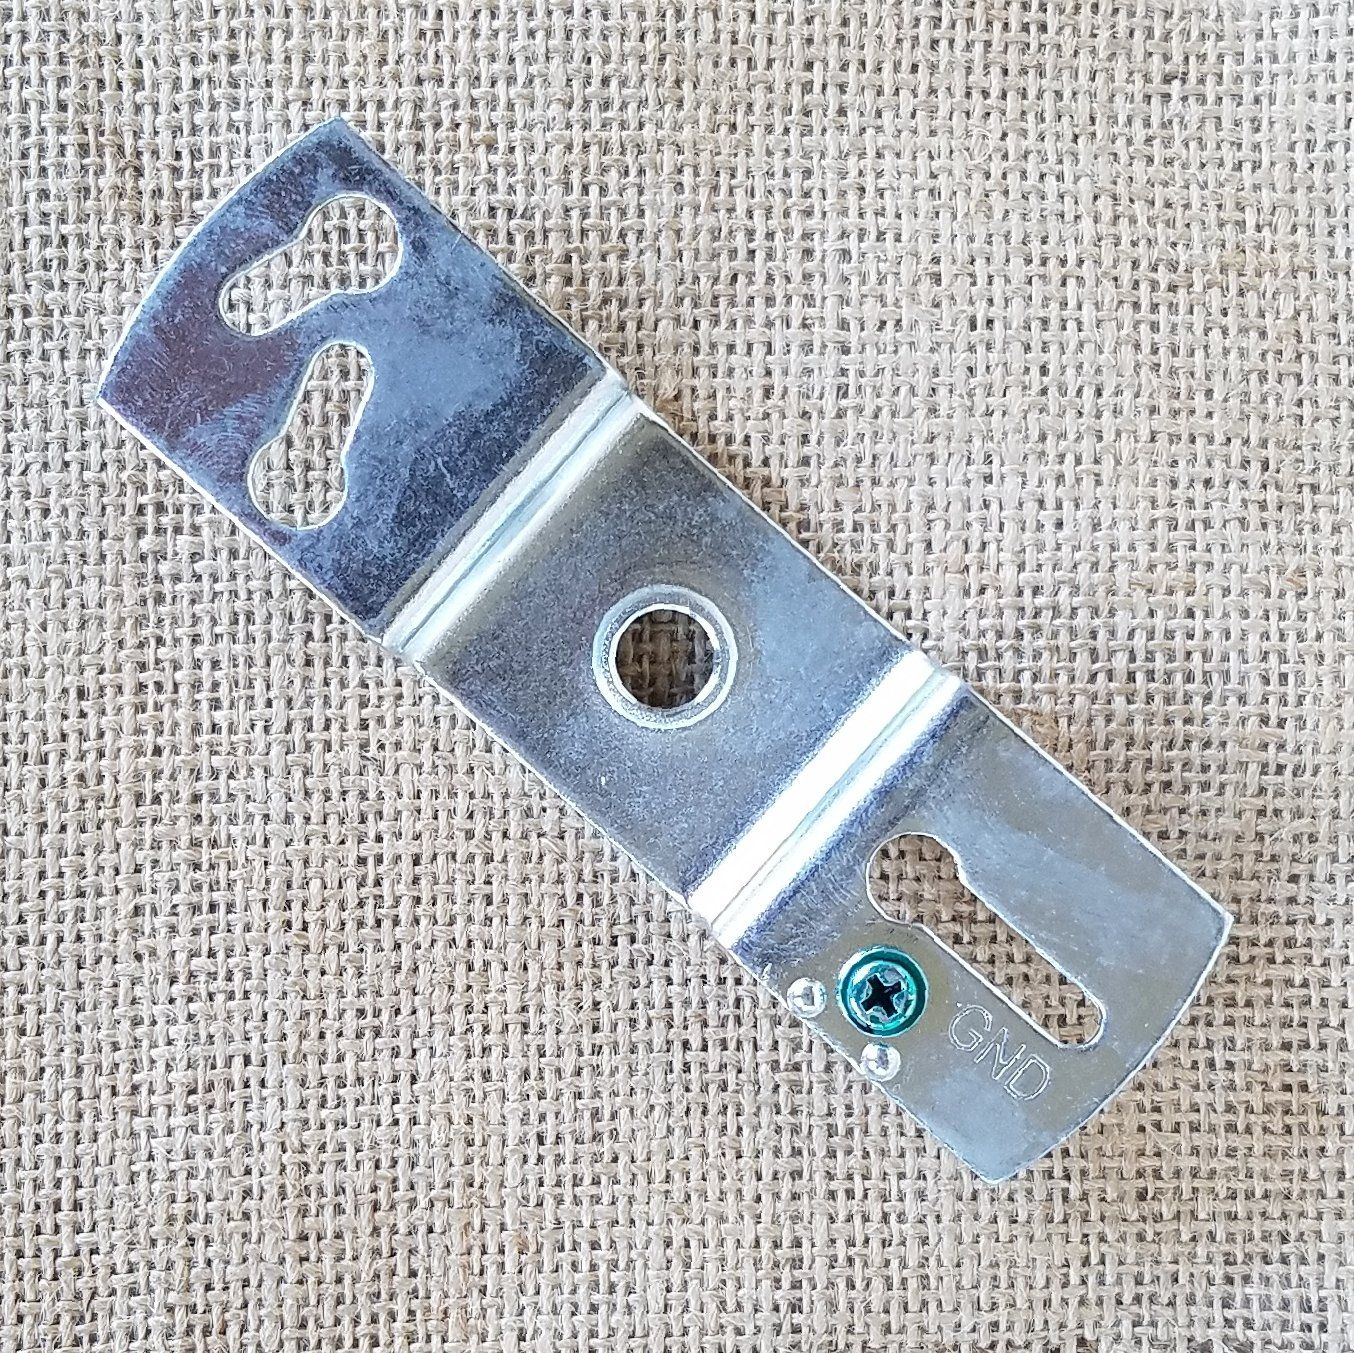 Premium Thick Zinc Light Fixture Crossbar Mounting Bracket Thread 1 8 Or 1 4 Ip Light Fixtures Mounting Brackets Threaded Rods